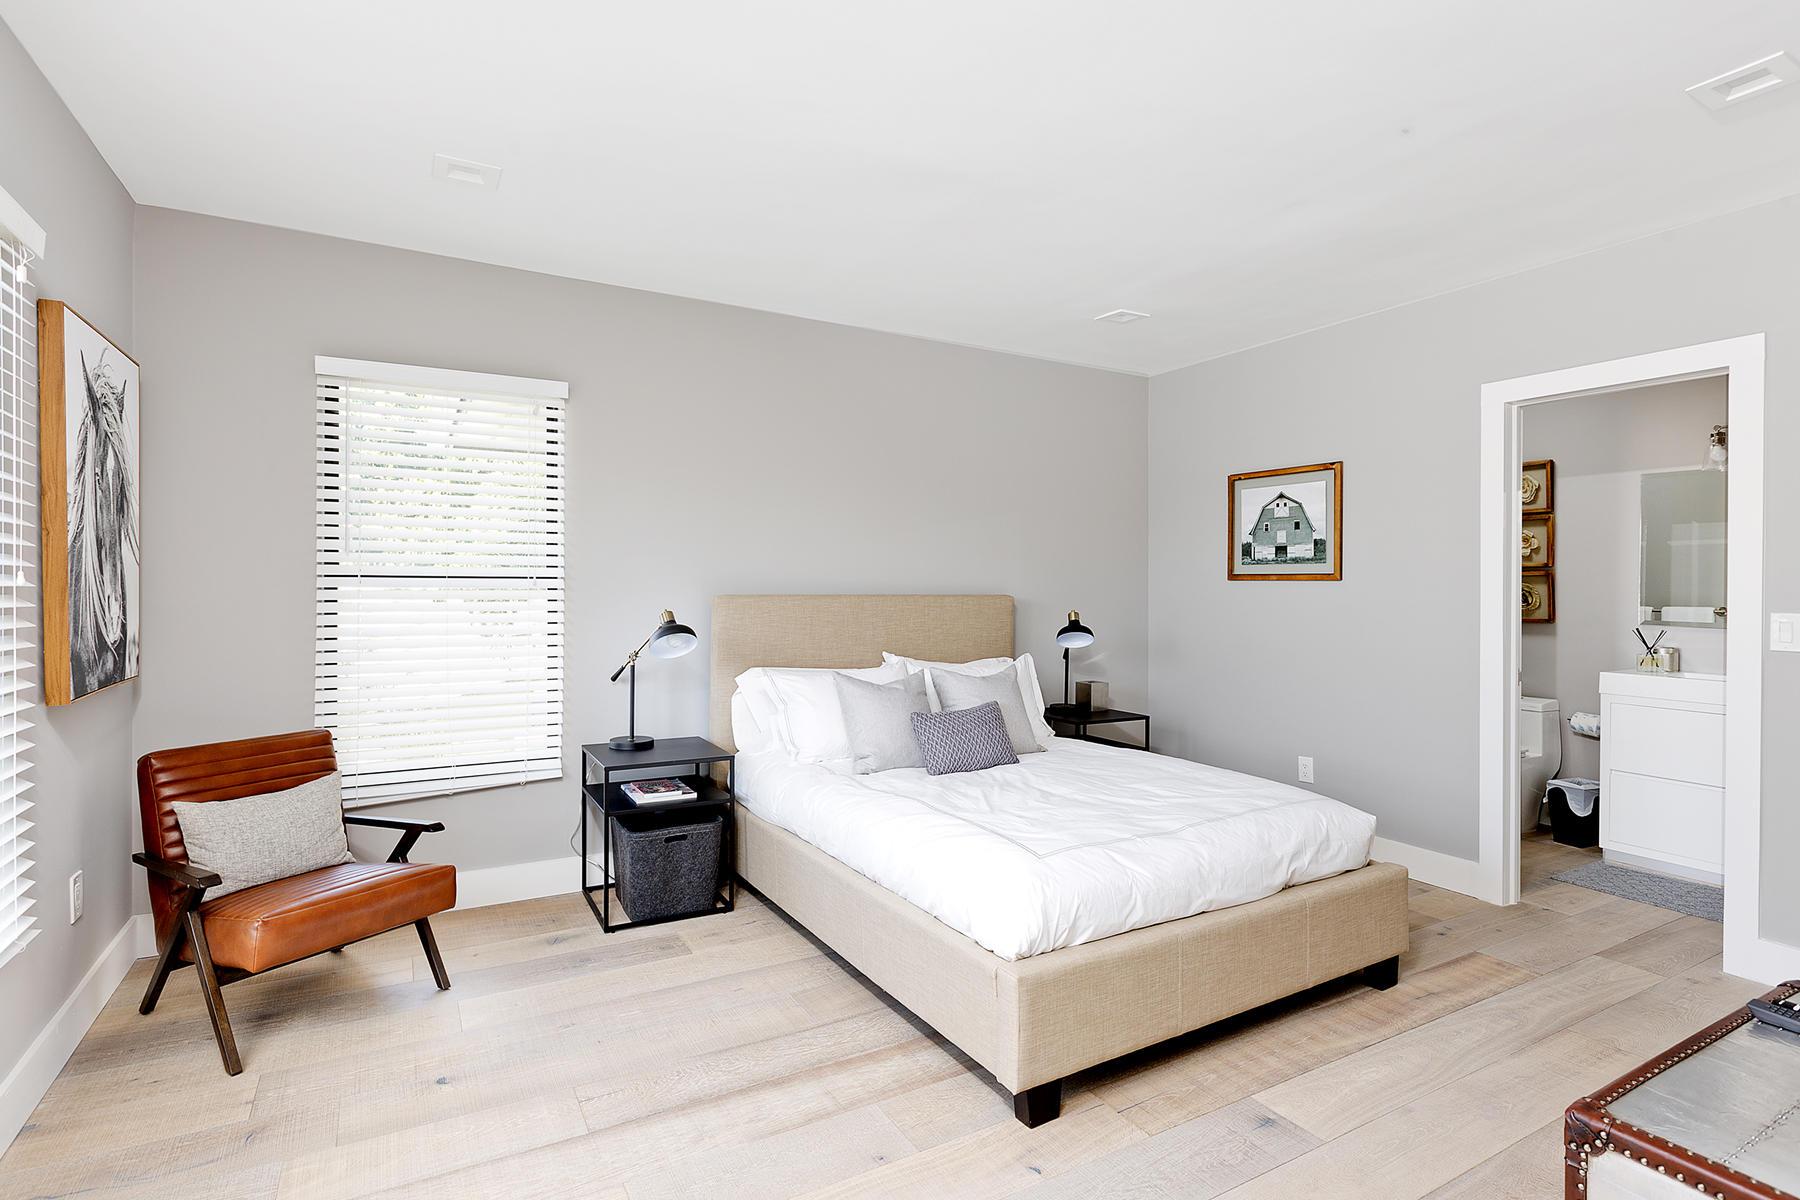 25_Bedroom2_Layout1